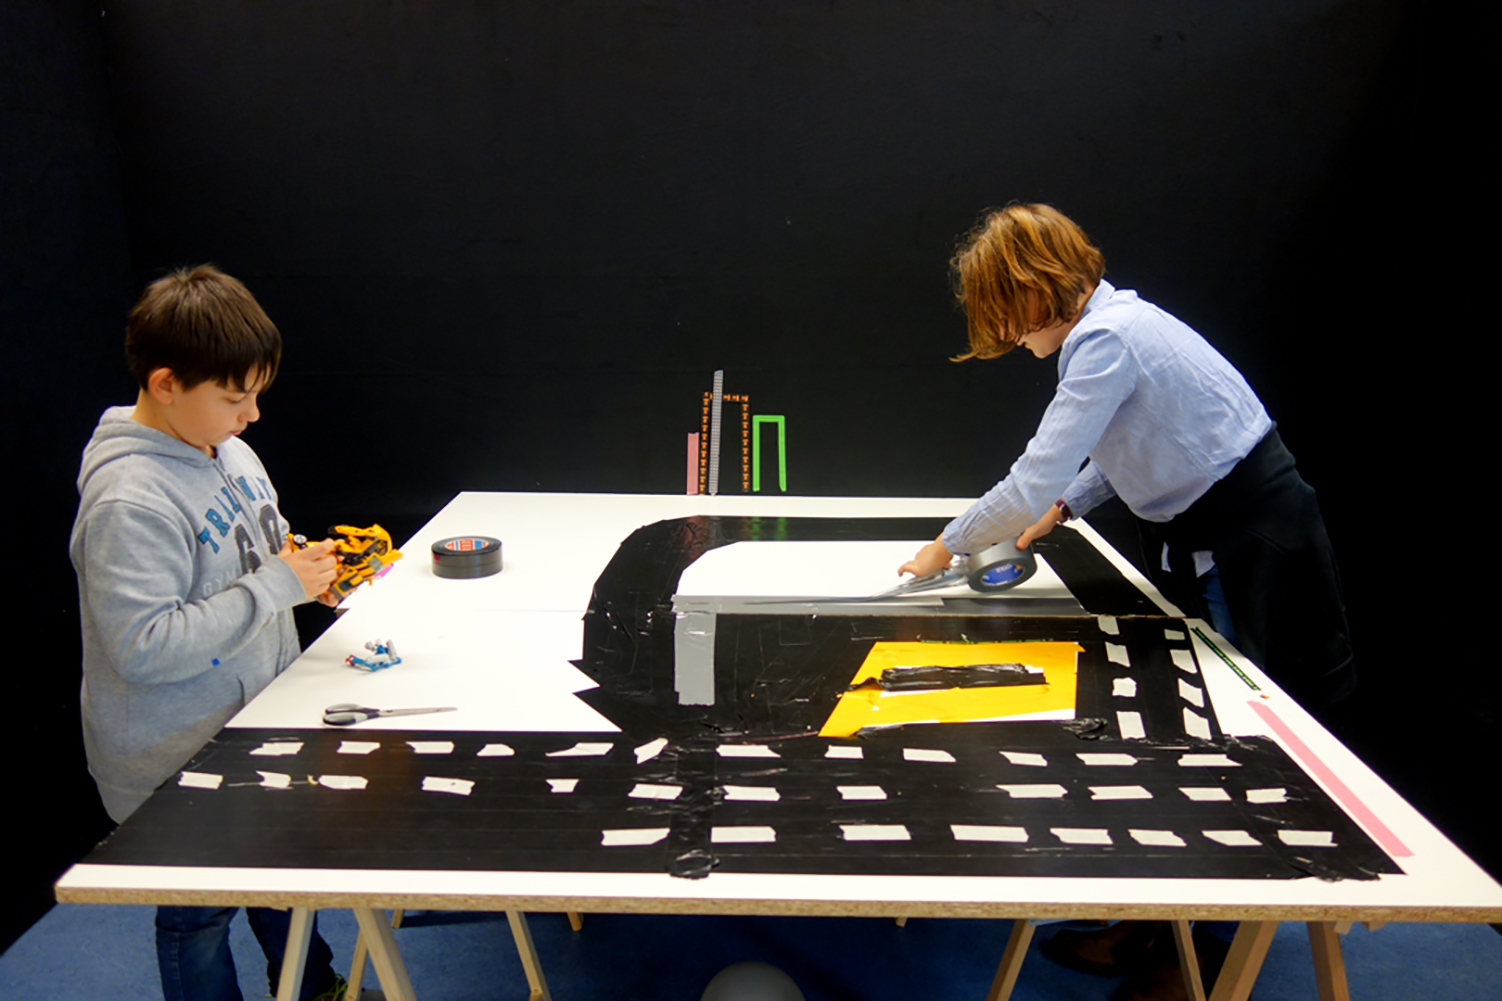 kunstlabore.de – Materialien für kreative Bildung in Schulen